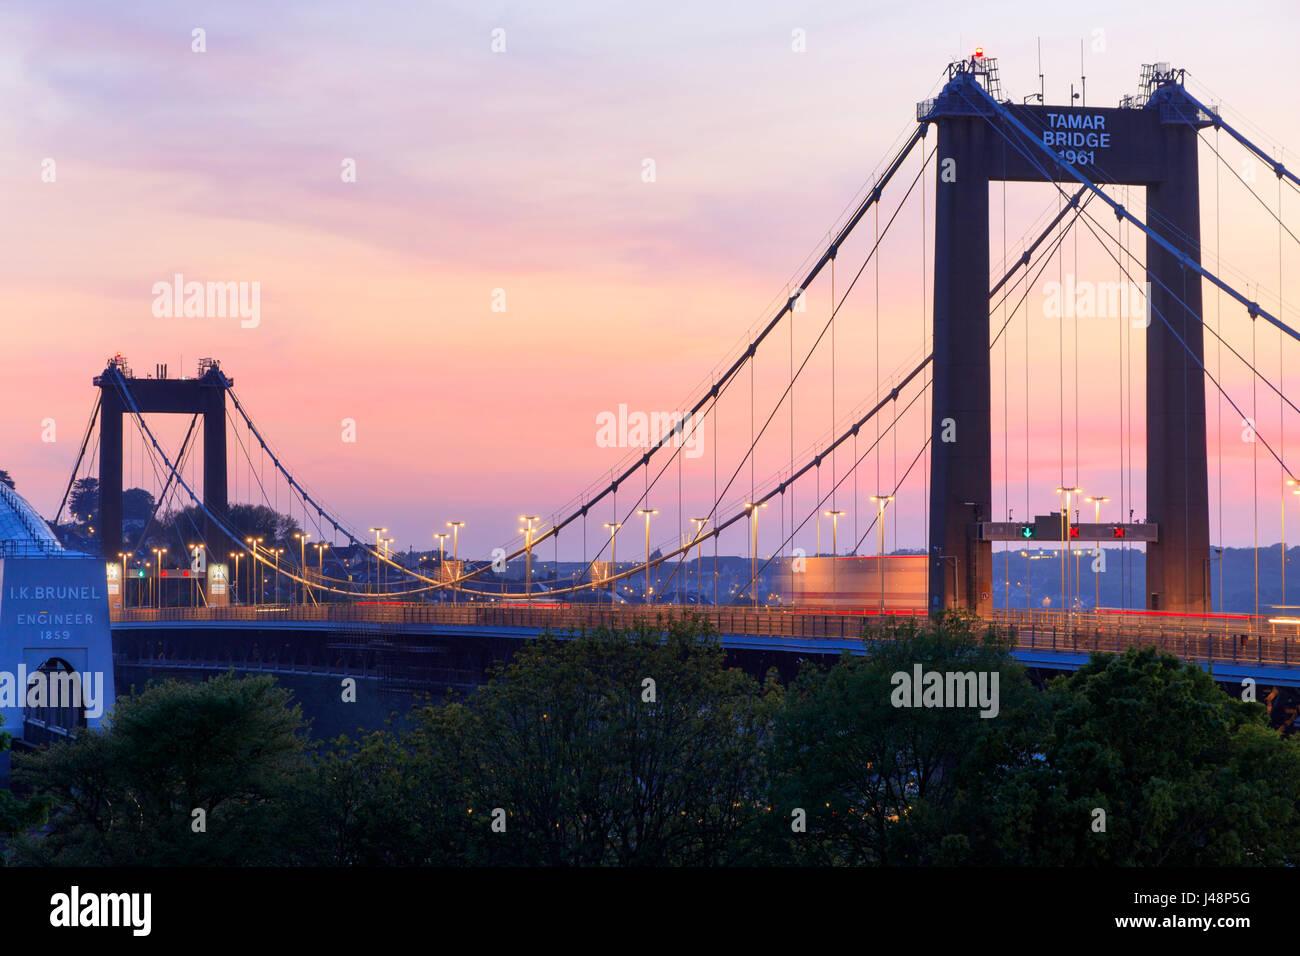 evening-shot-of-the-tamar-road-bridge-li